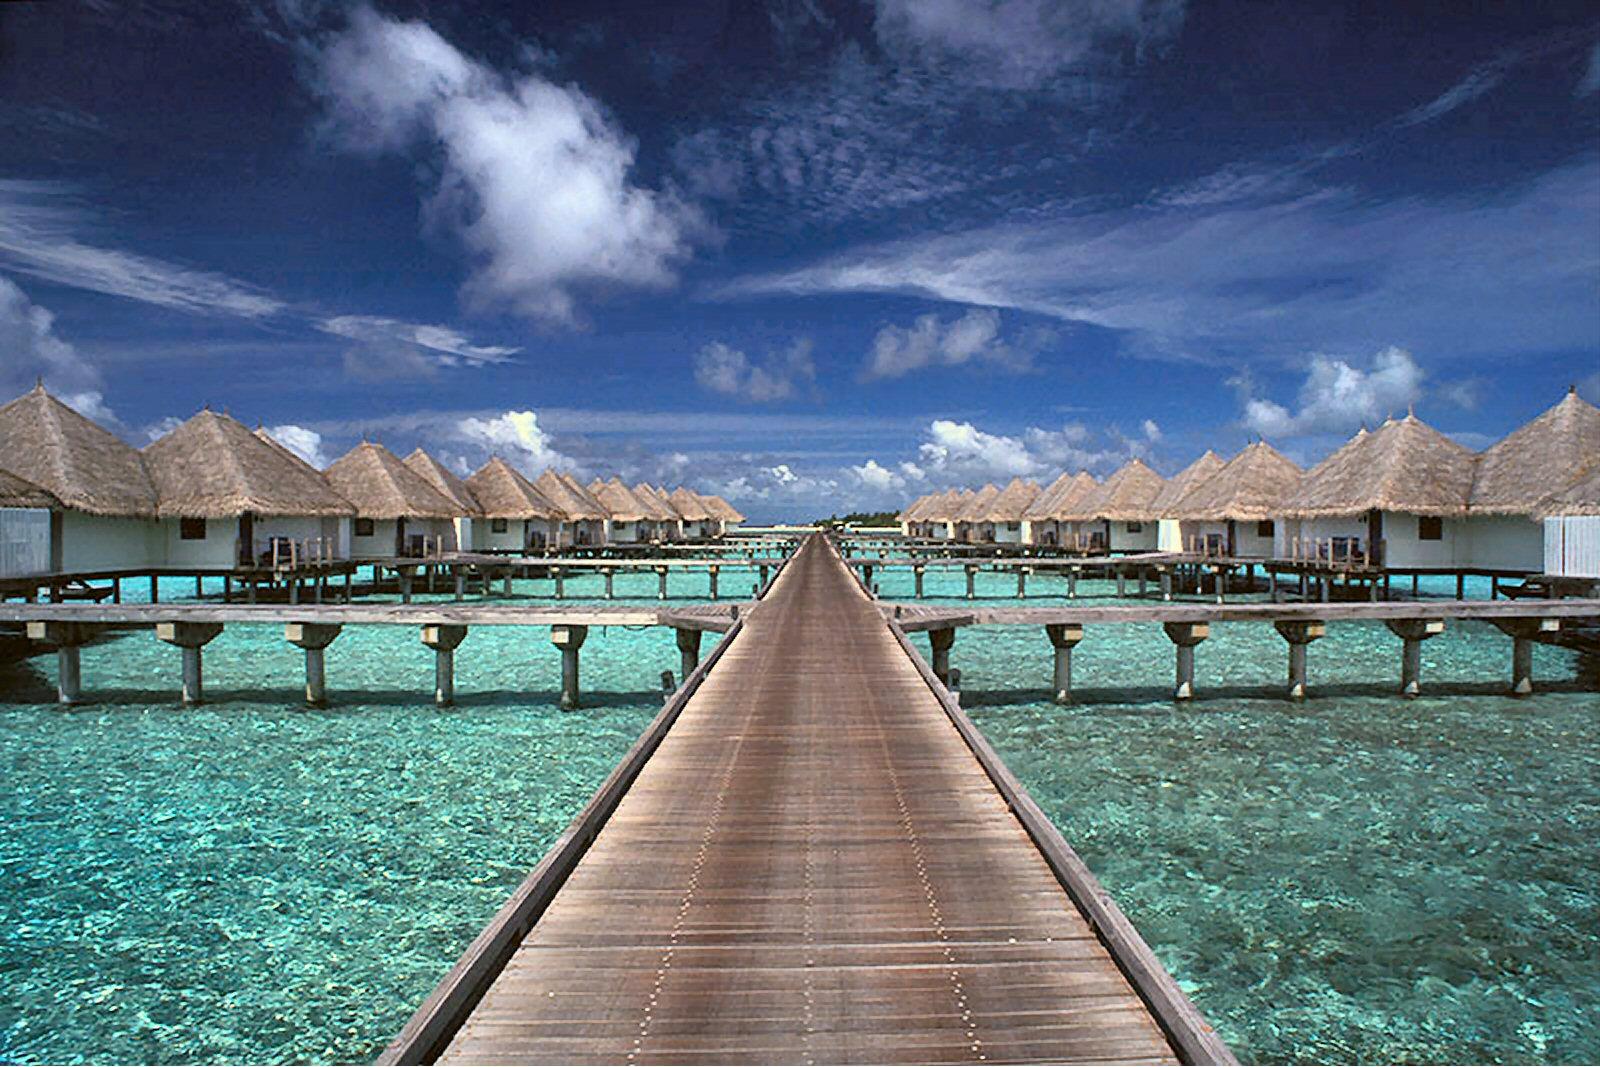 http://www.infokart.ru/wp-content/uploads/2011/01/travel-maldives.jpg